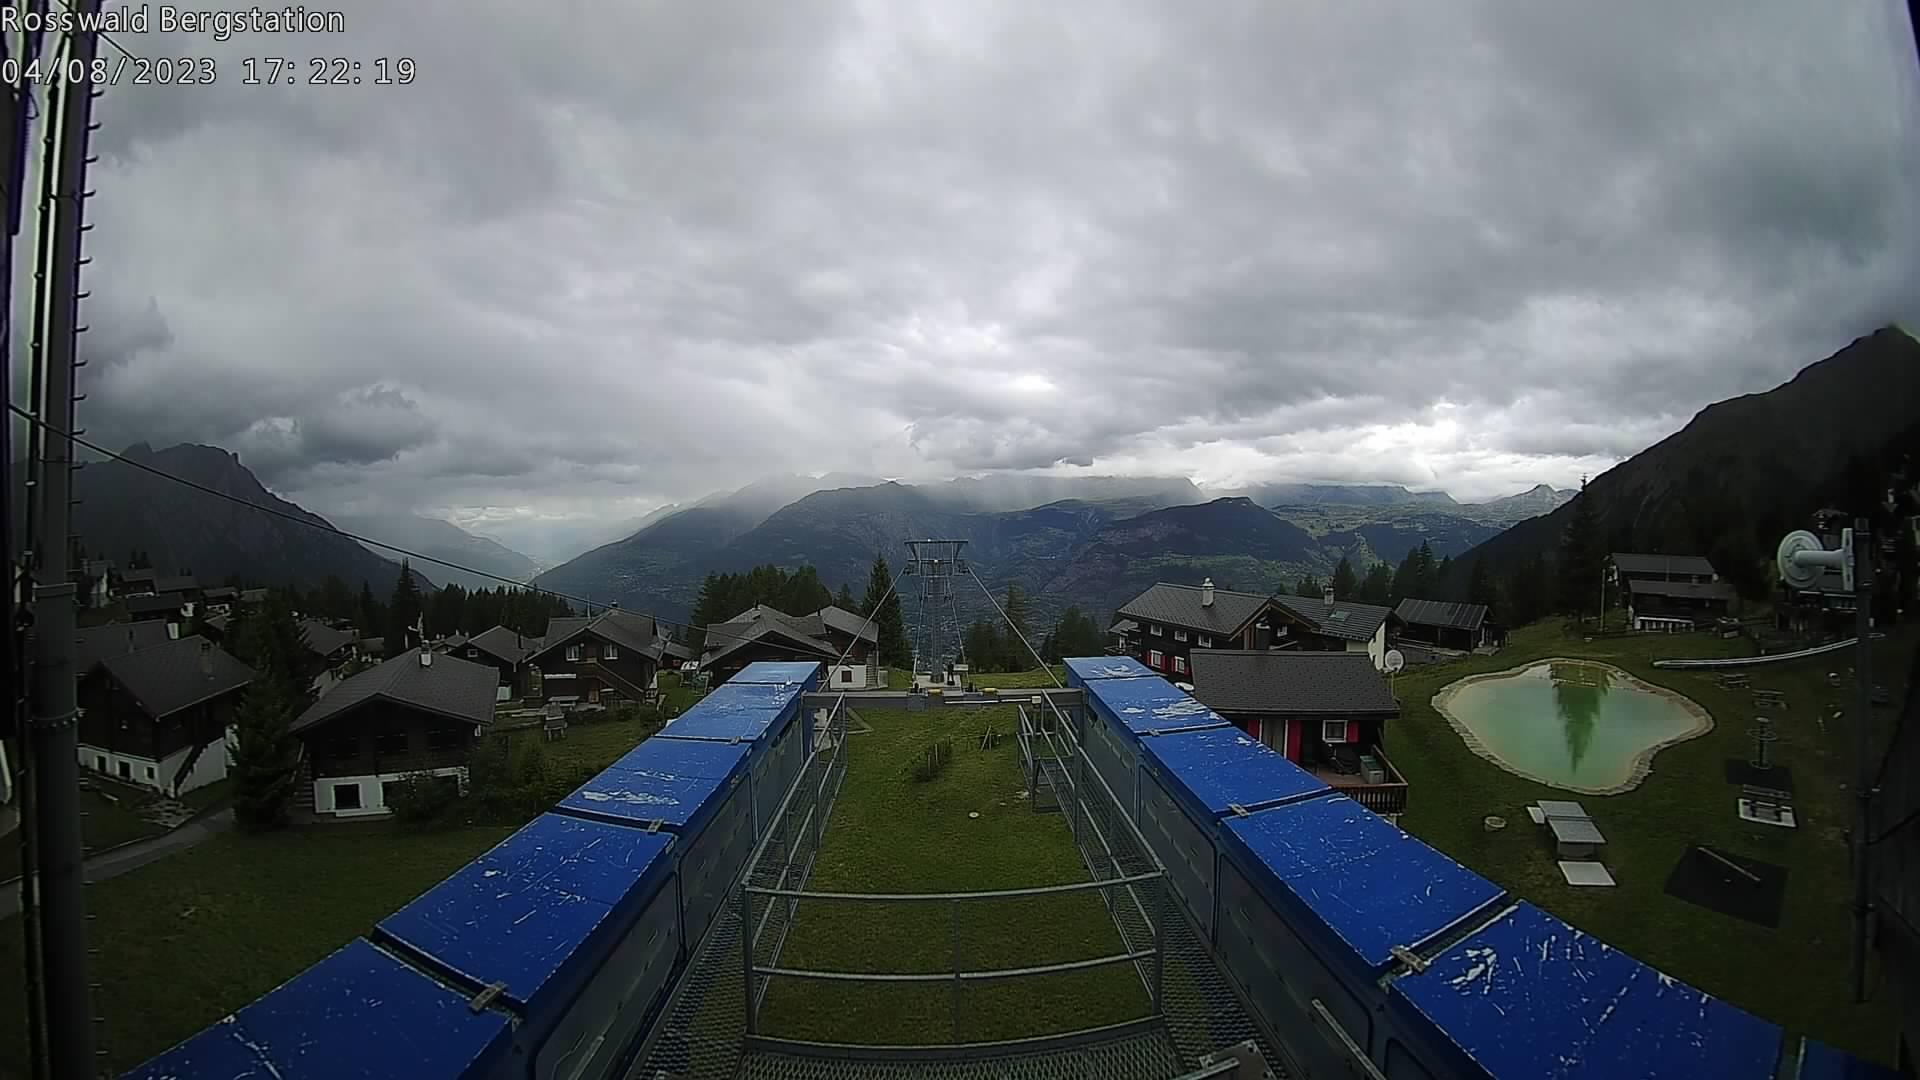 Rosswald Bergstation